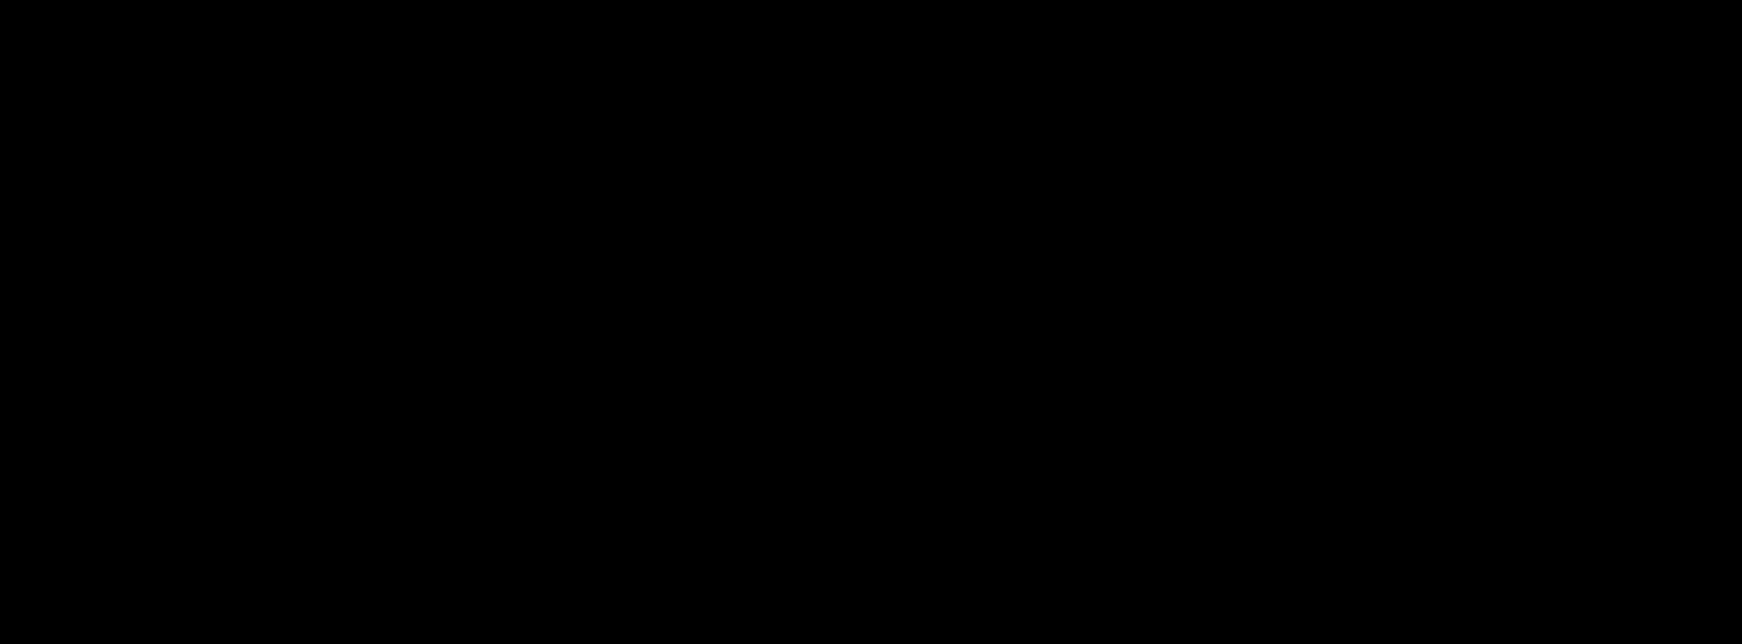 A 803467